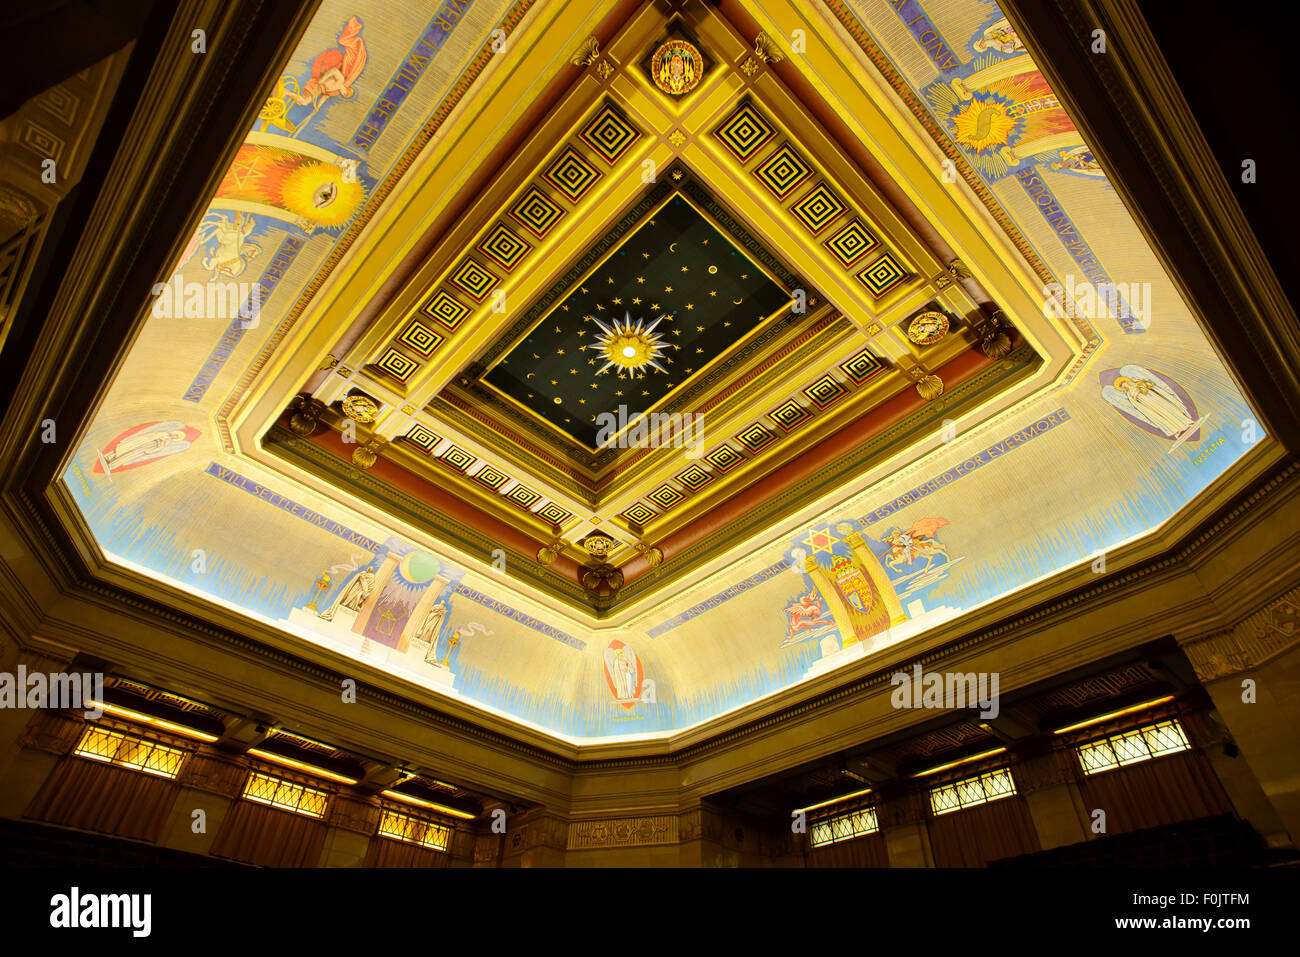 Grand Temple Room at the Freemasons Hall, London, England, United Kingdom - Stock Image